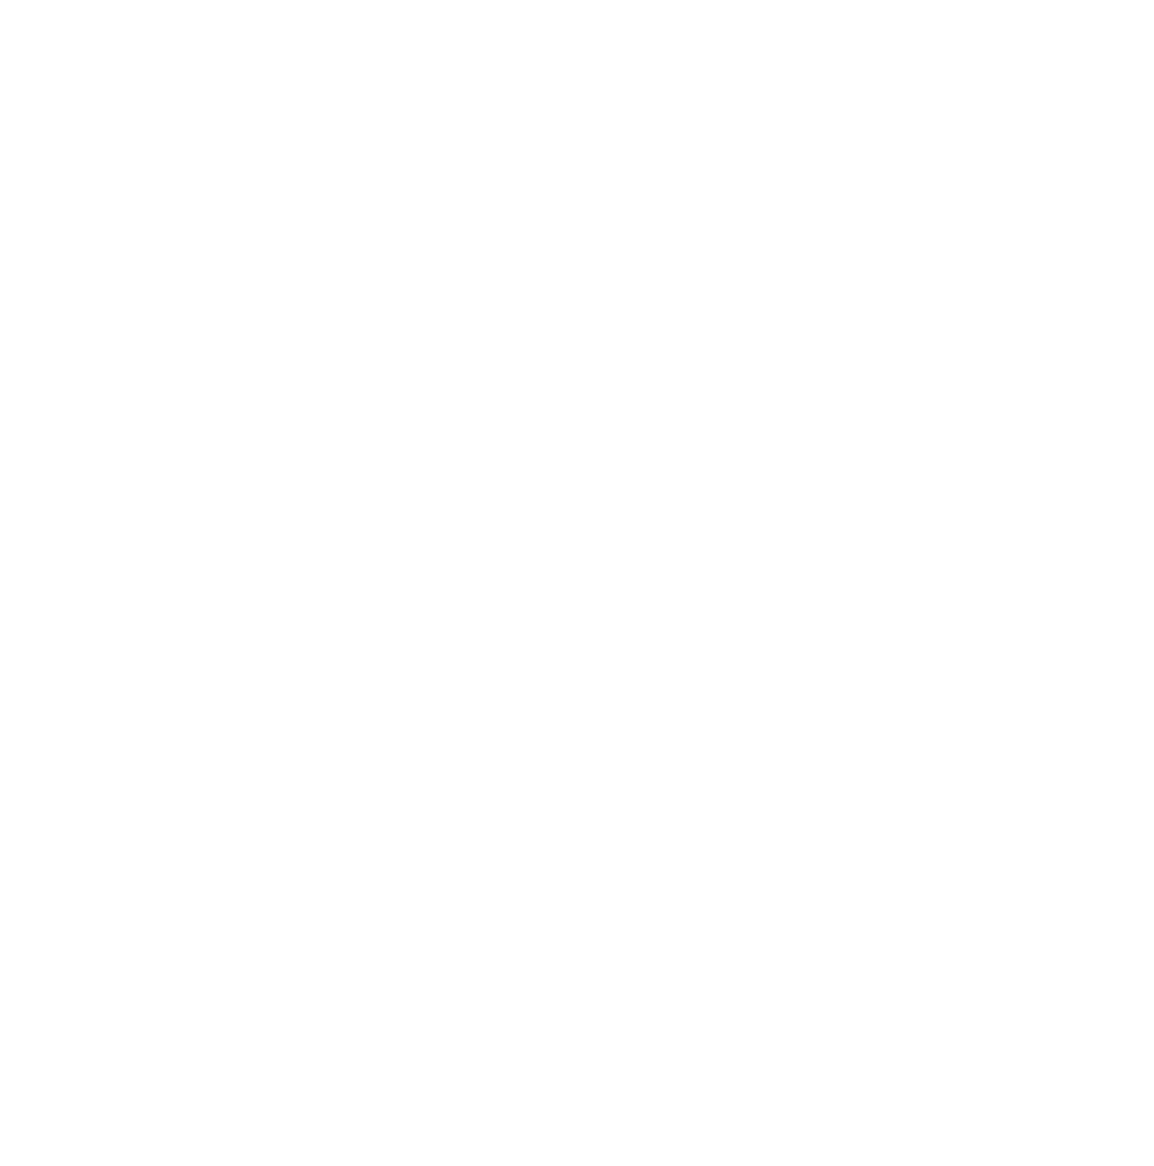 logo-bignoise.png